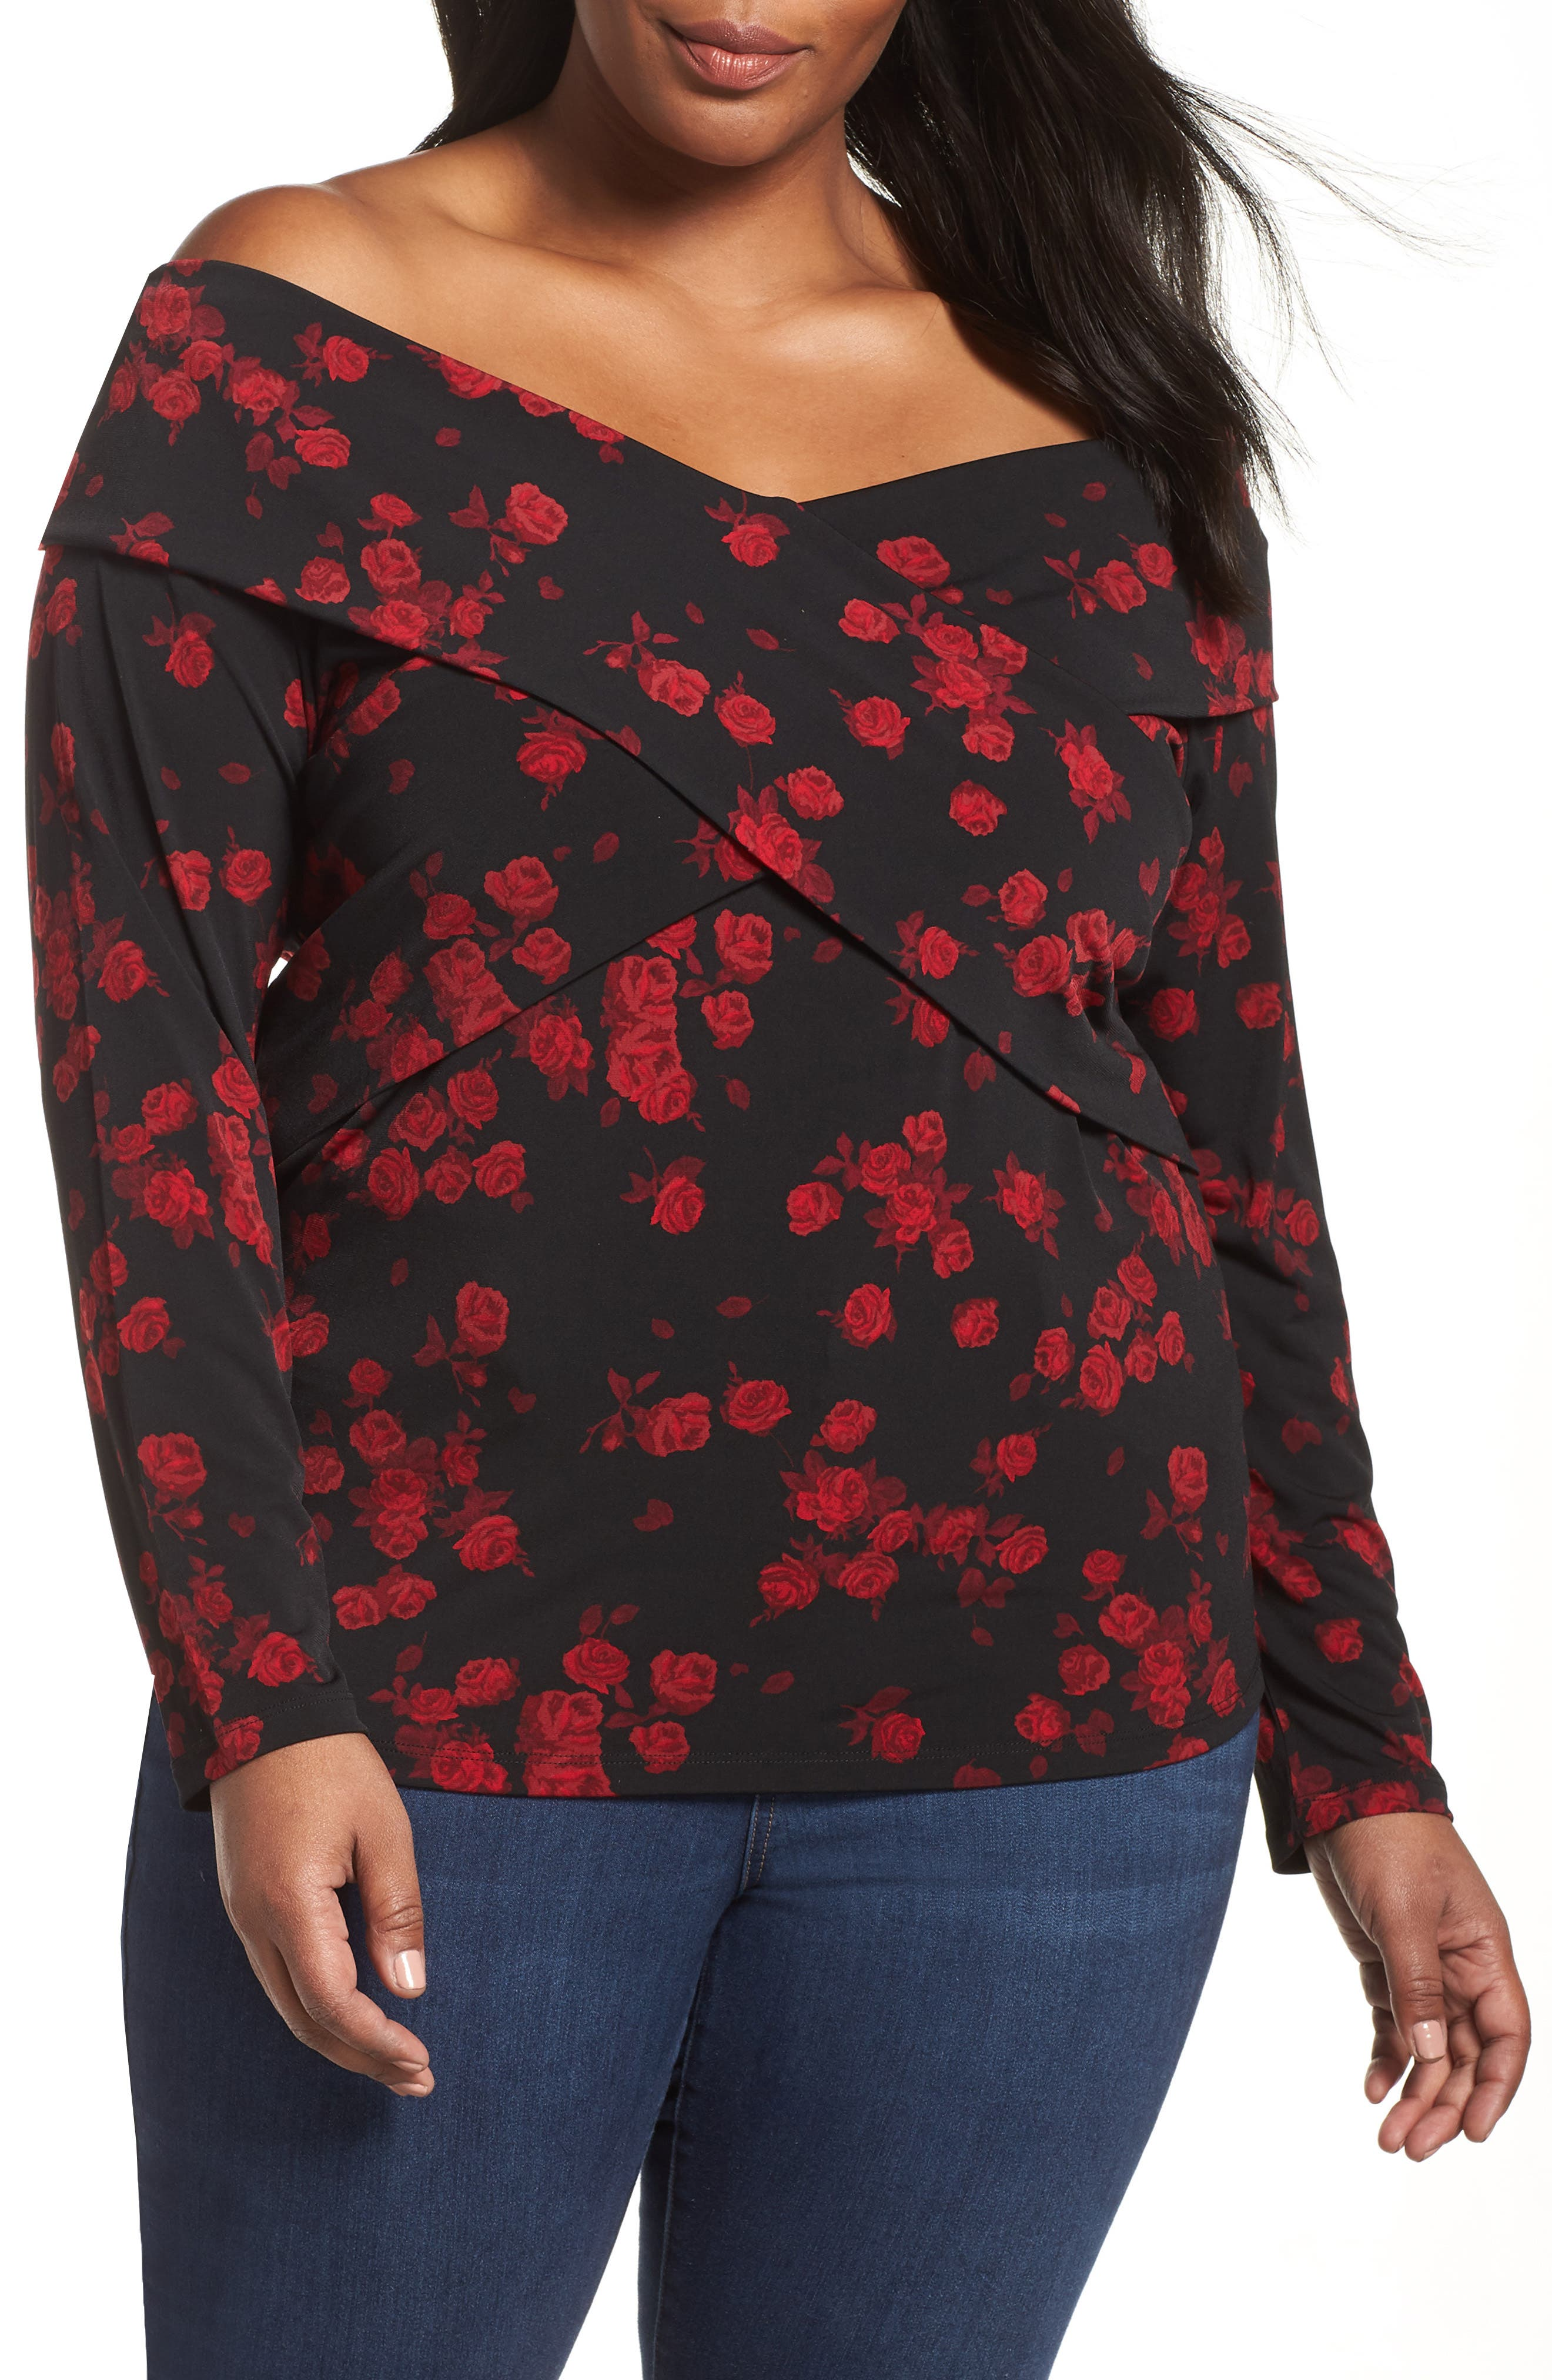 Off the Shoulder Rose Top,                         Main,                         color, BLACK/ RED CURRANT